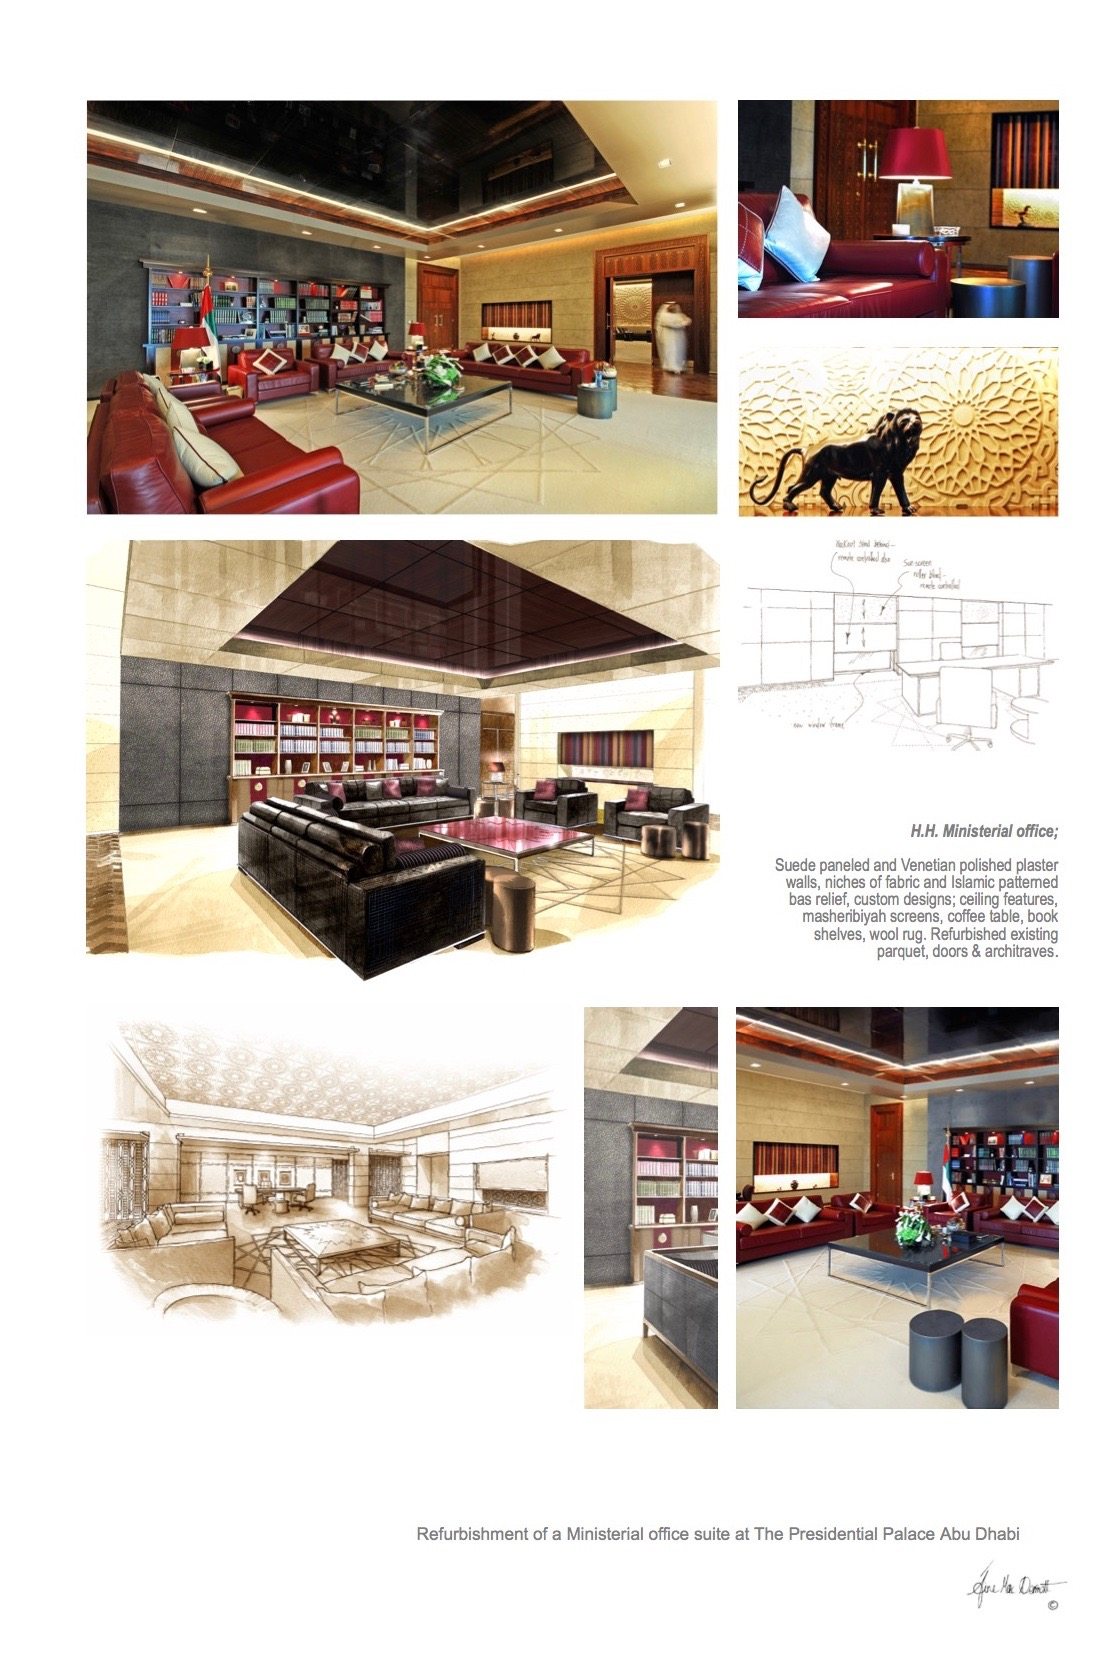 aine-mac-dermott-shk-mansour-office-diwan-folio-2.jpg